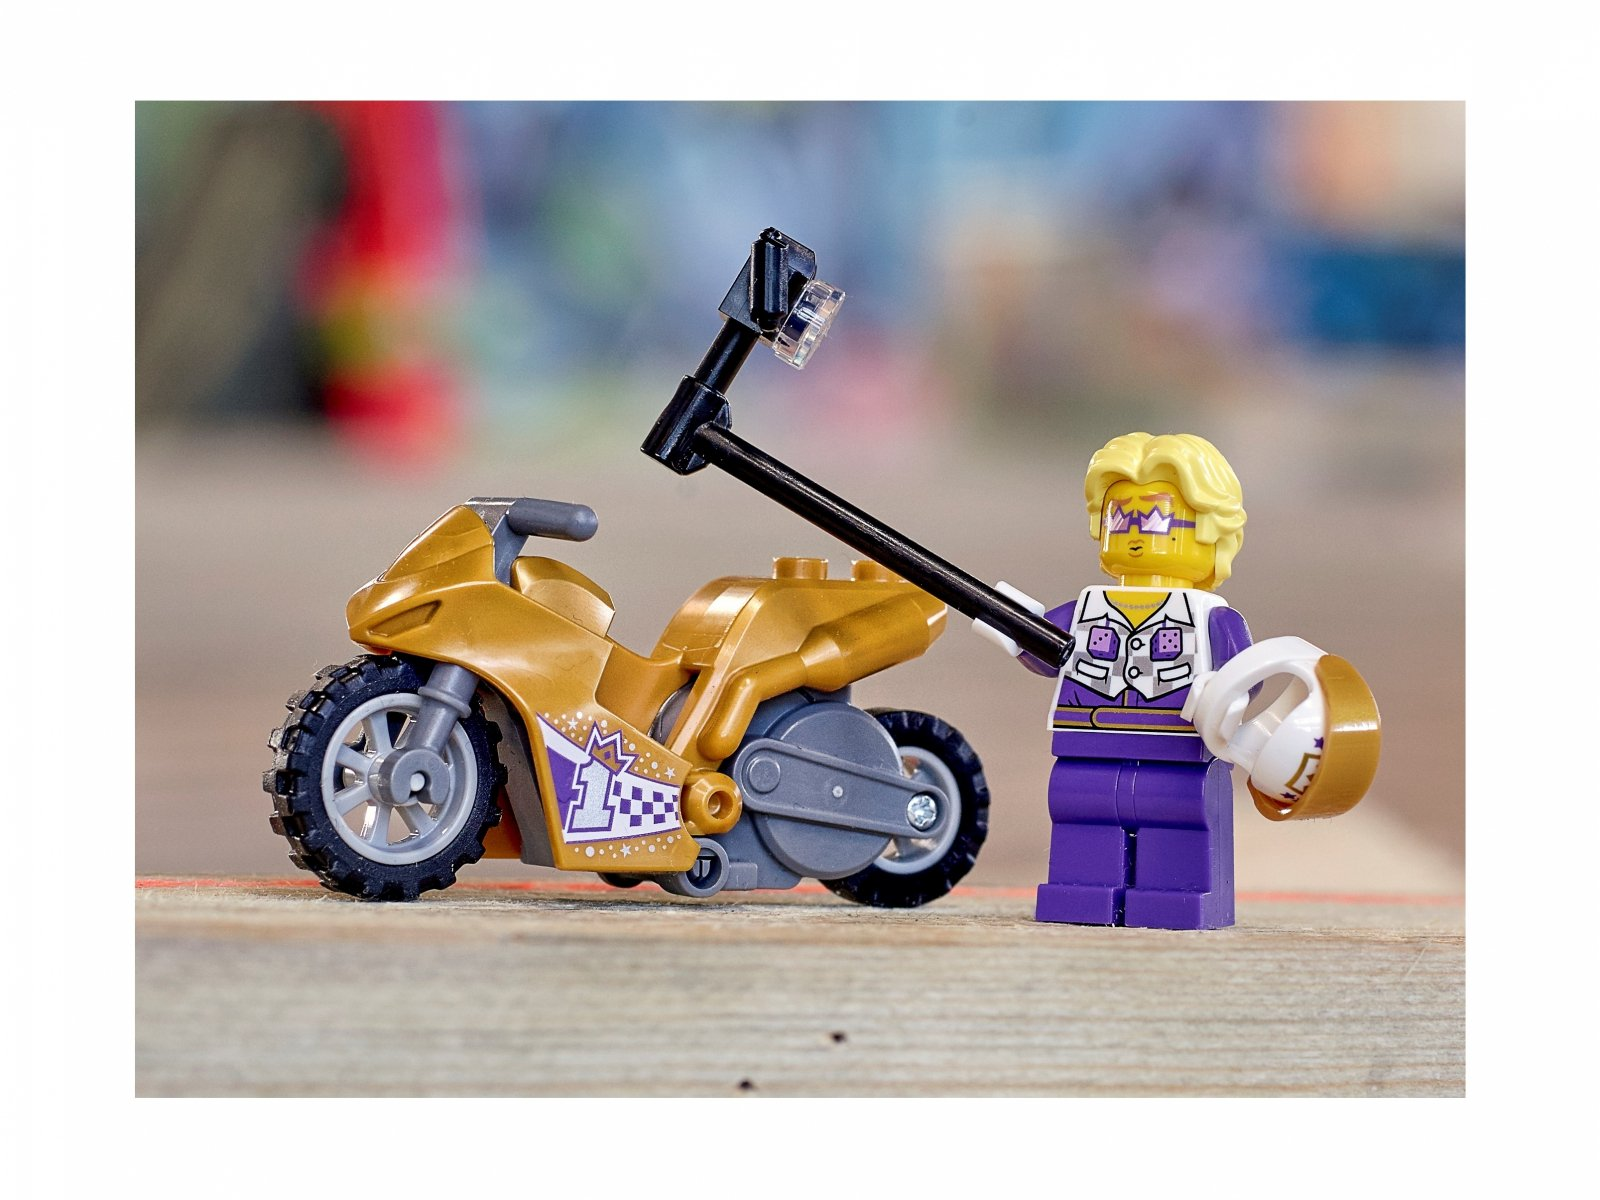 LEGO 60309 City Selfie na motocyklu kaskaderskim